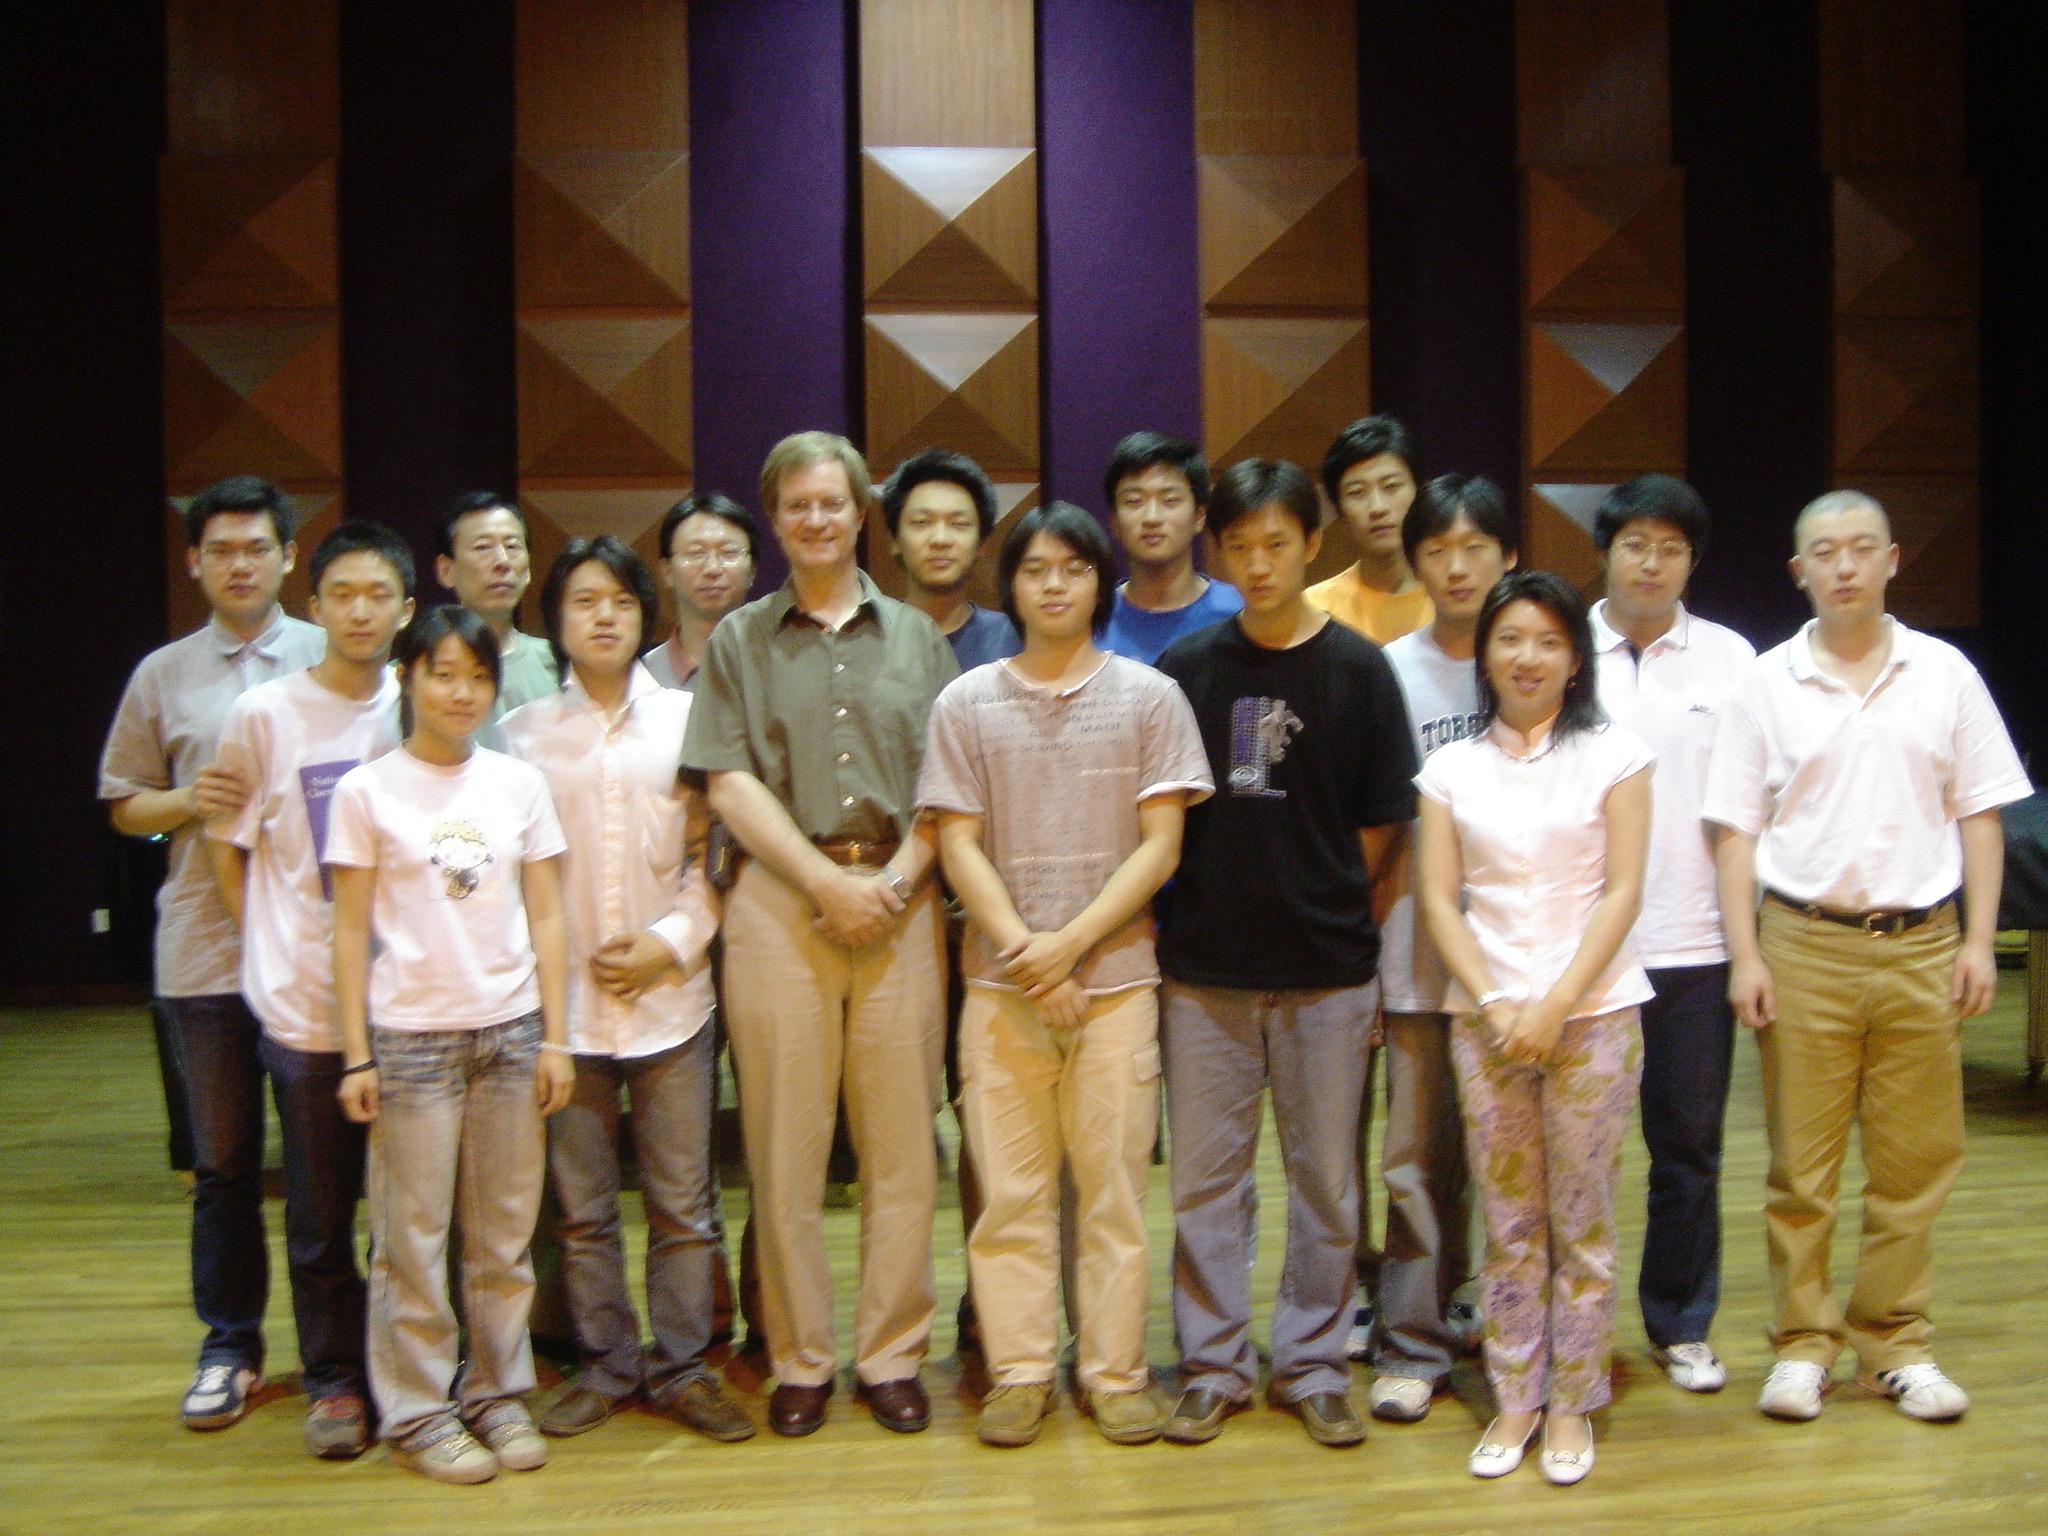 Class at CCOM 17-06 i.jpg